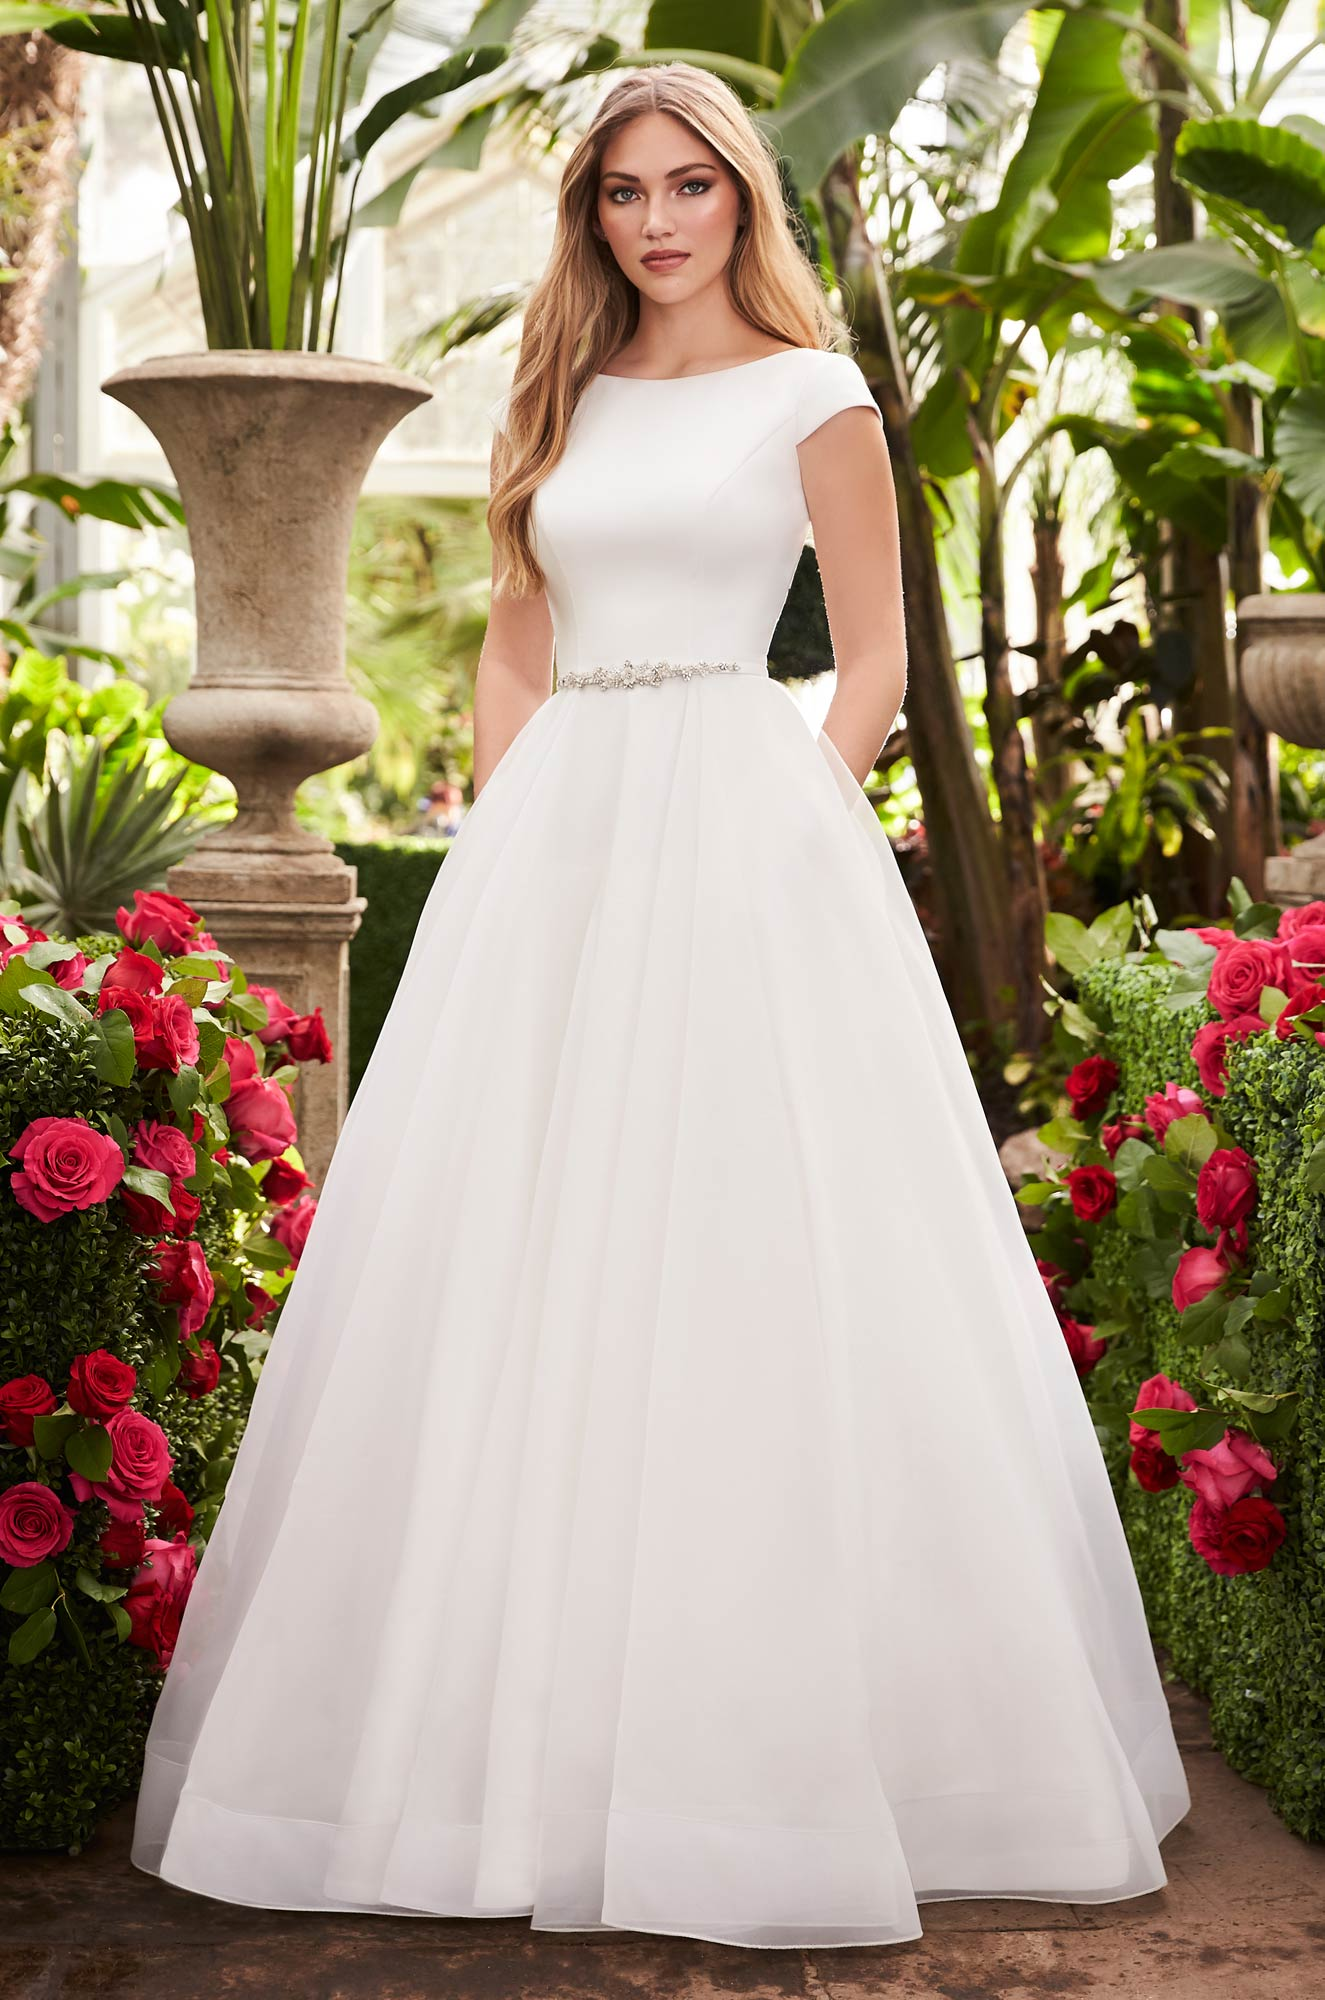 Breathtaking Cap Sleeve Wedding Dress – Style #2253 | Mikaella Bridal